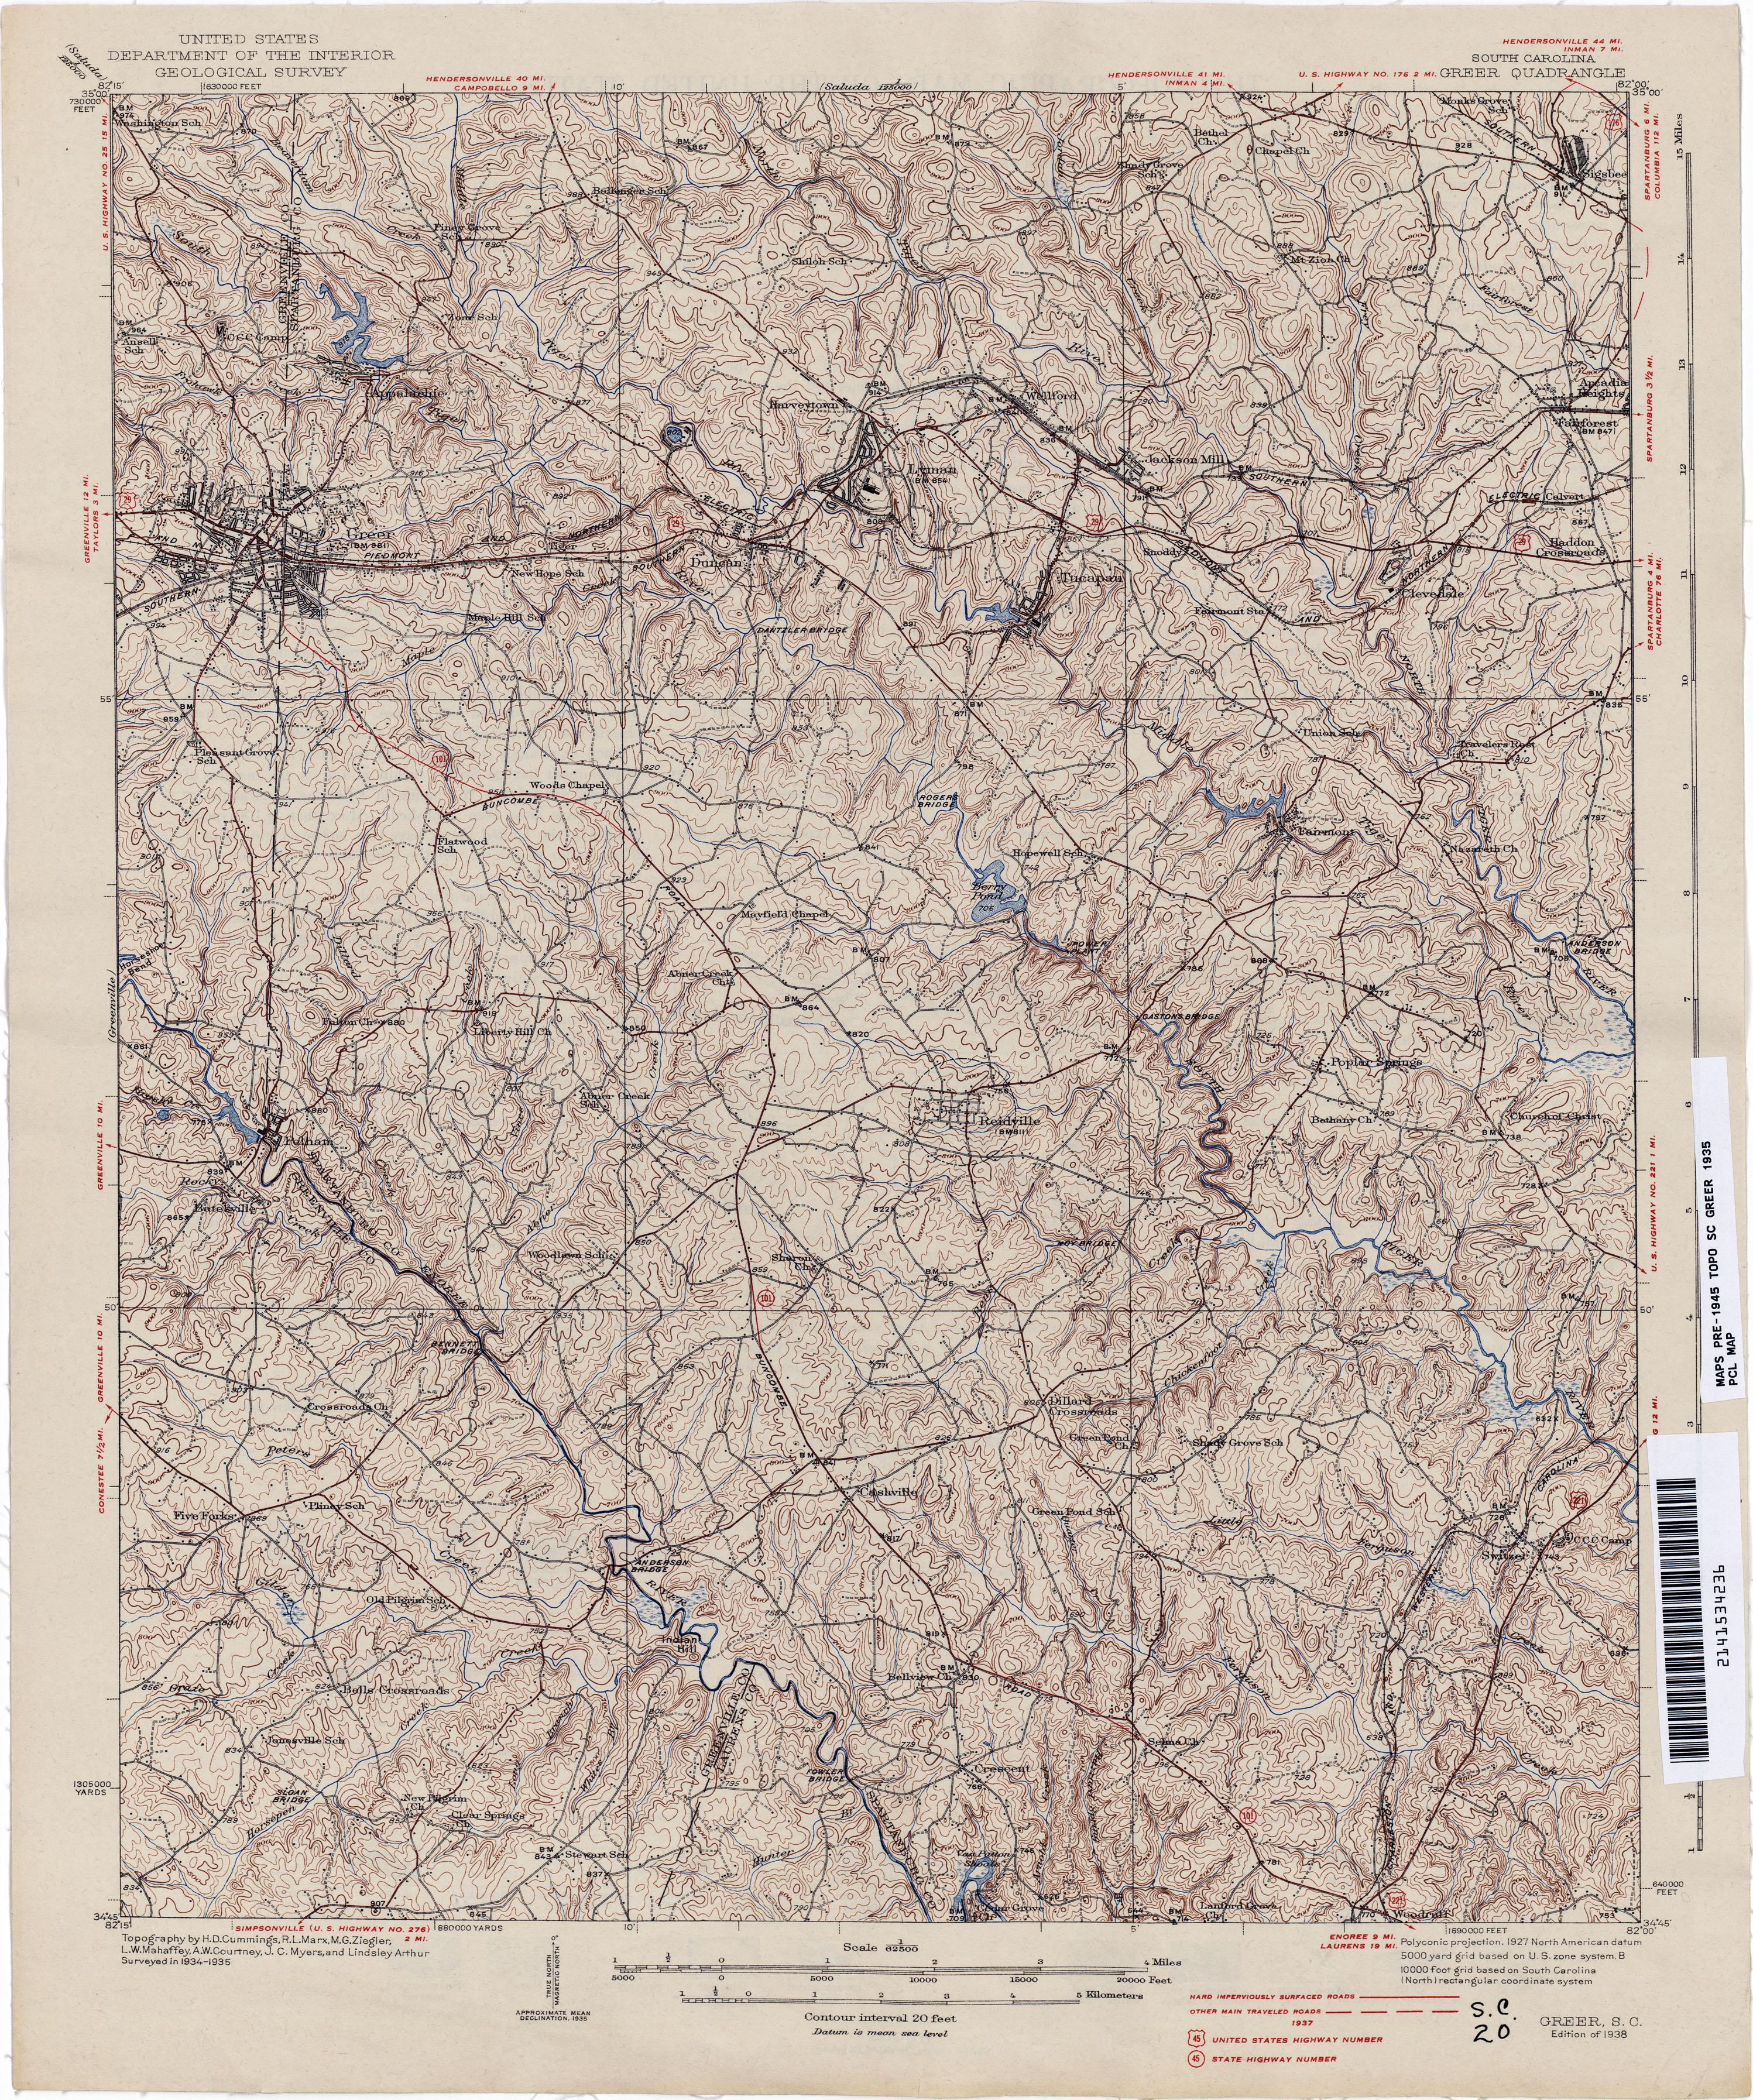 South Carolina Historical Topographic Maps Perry Castaneda Map